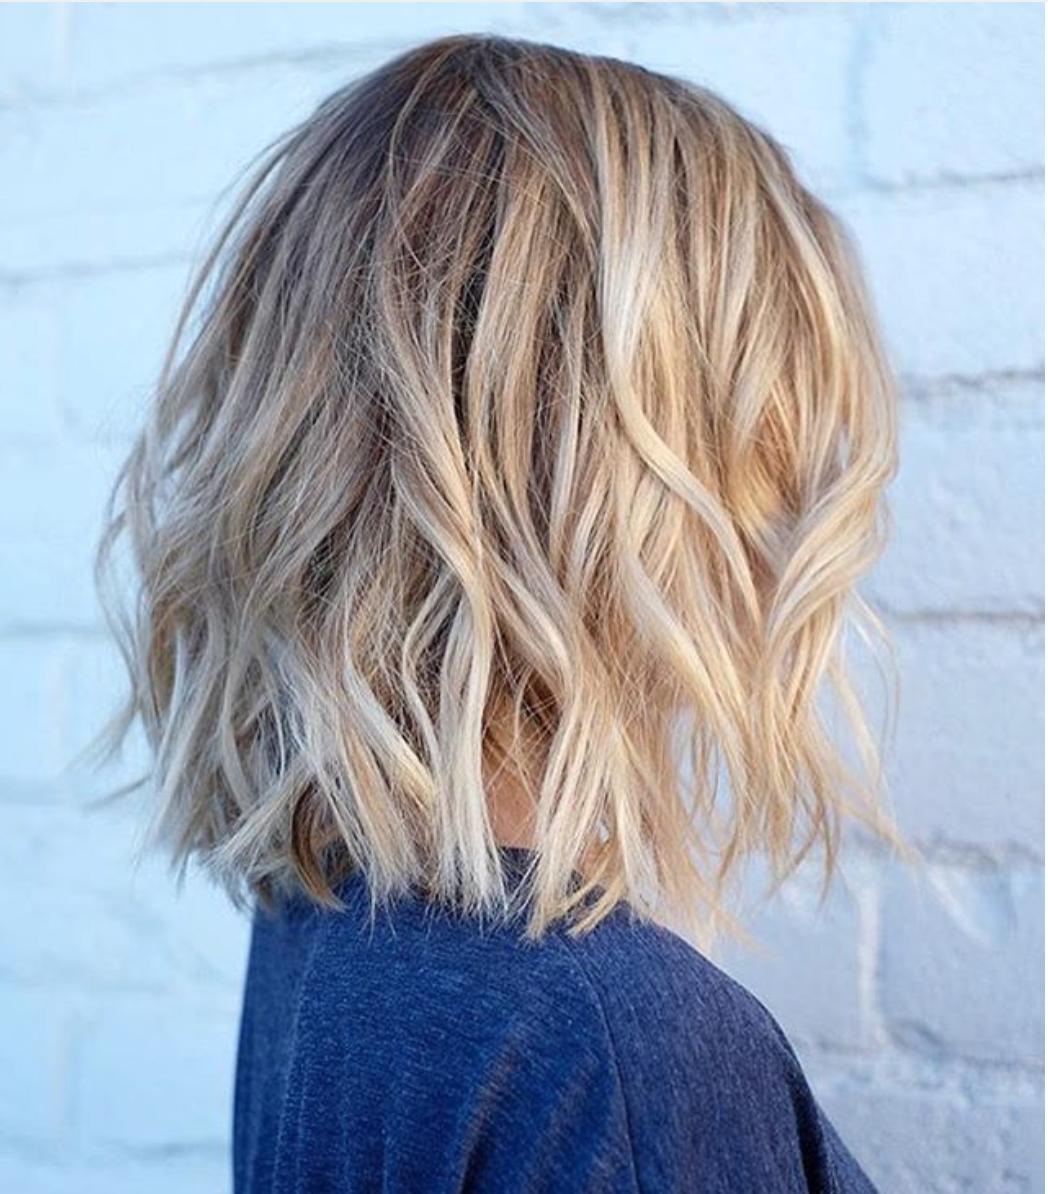 Pin by julia forstpointner on hair styles pinterest